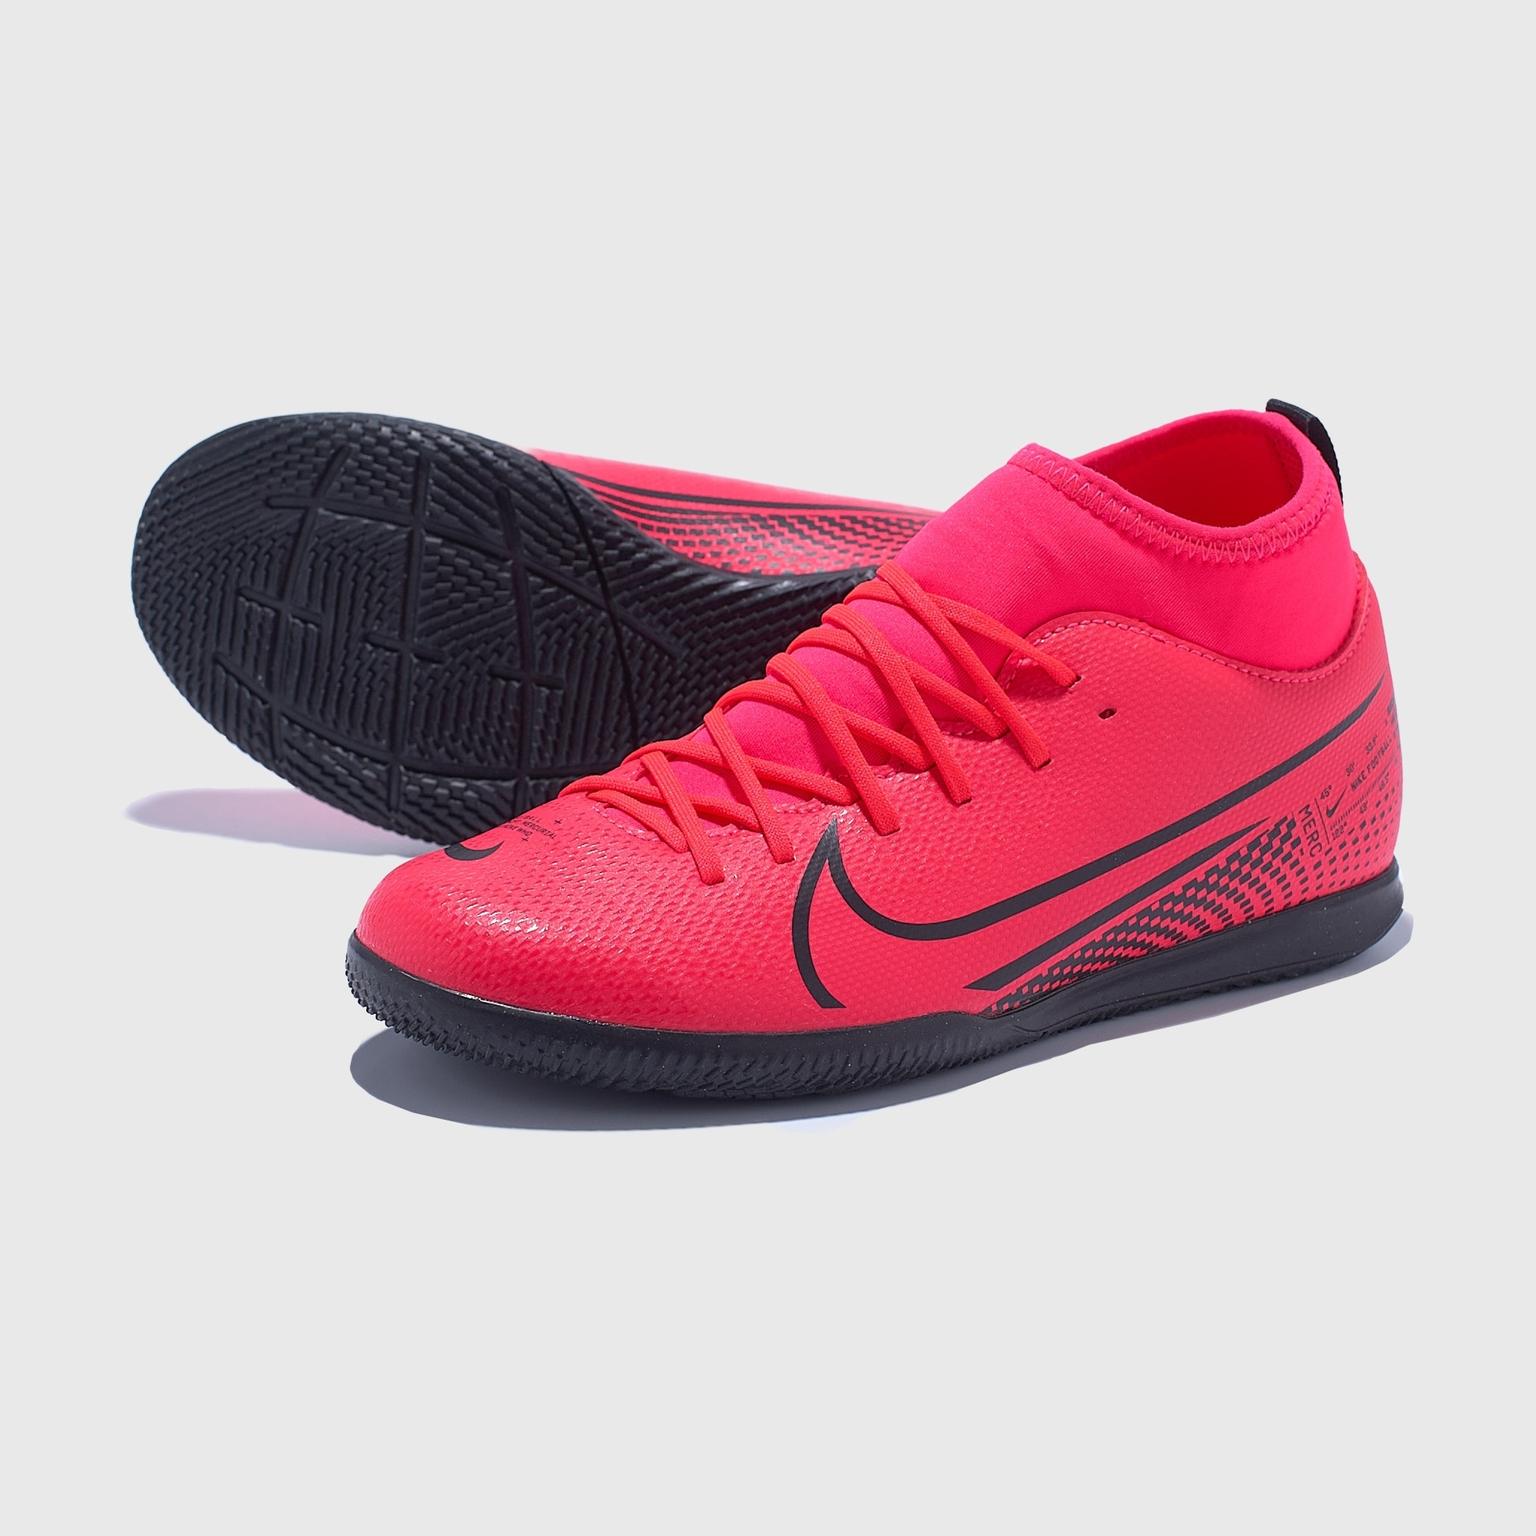 Футзалки детские Nike Superfly 7 Club IC AT8153-606 футзалки детские nike legend 8 academy ic at5735 606